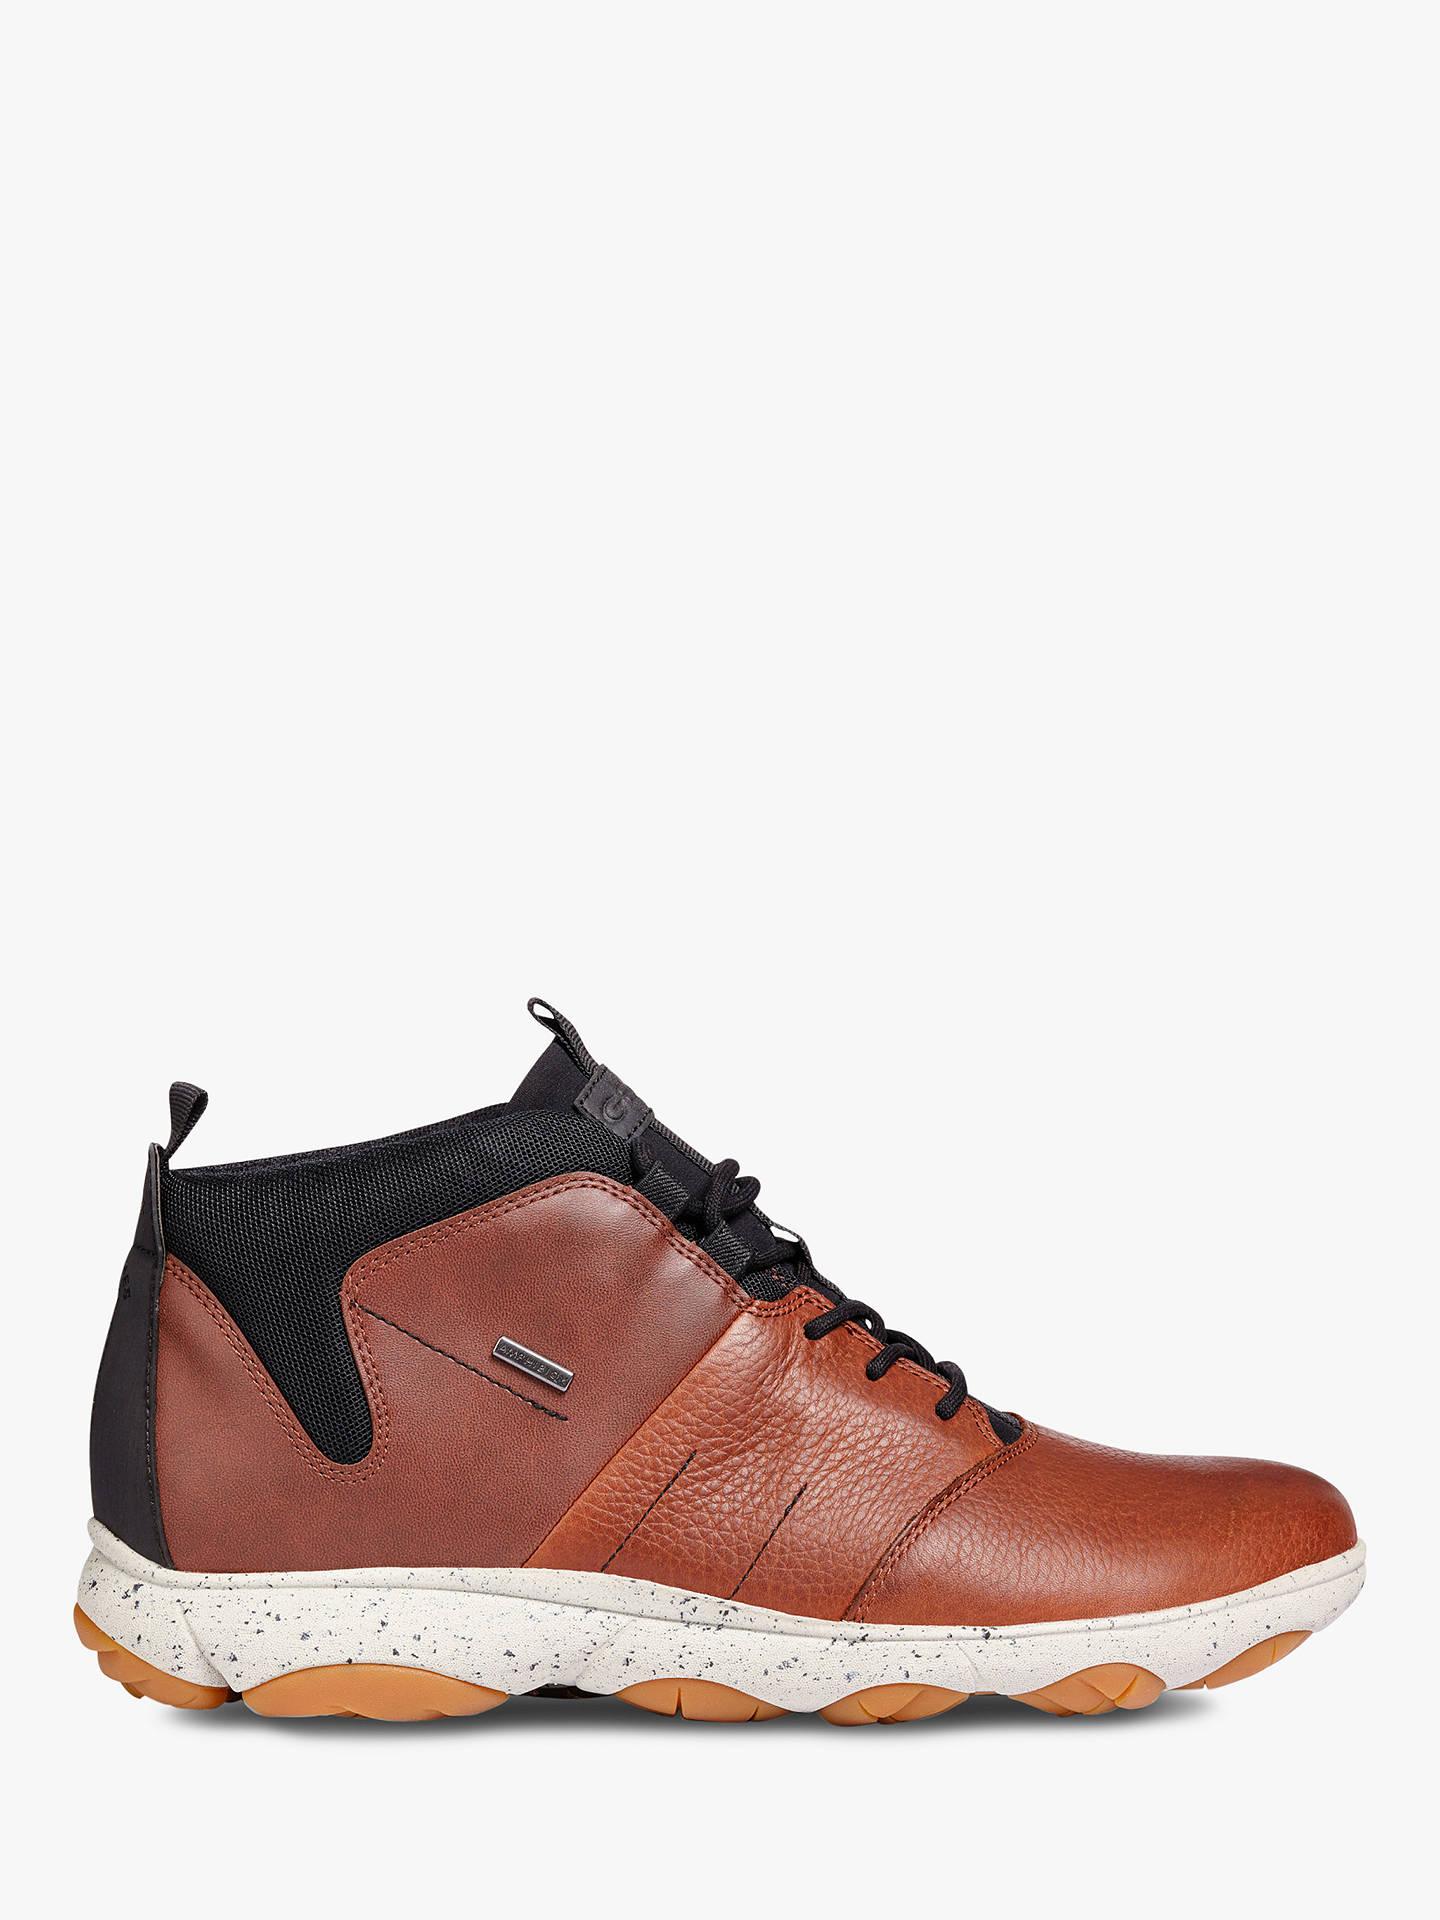 geox nebula men's boots